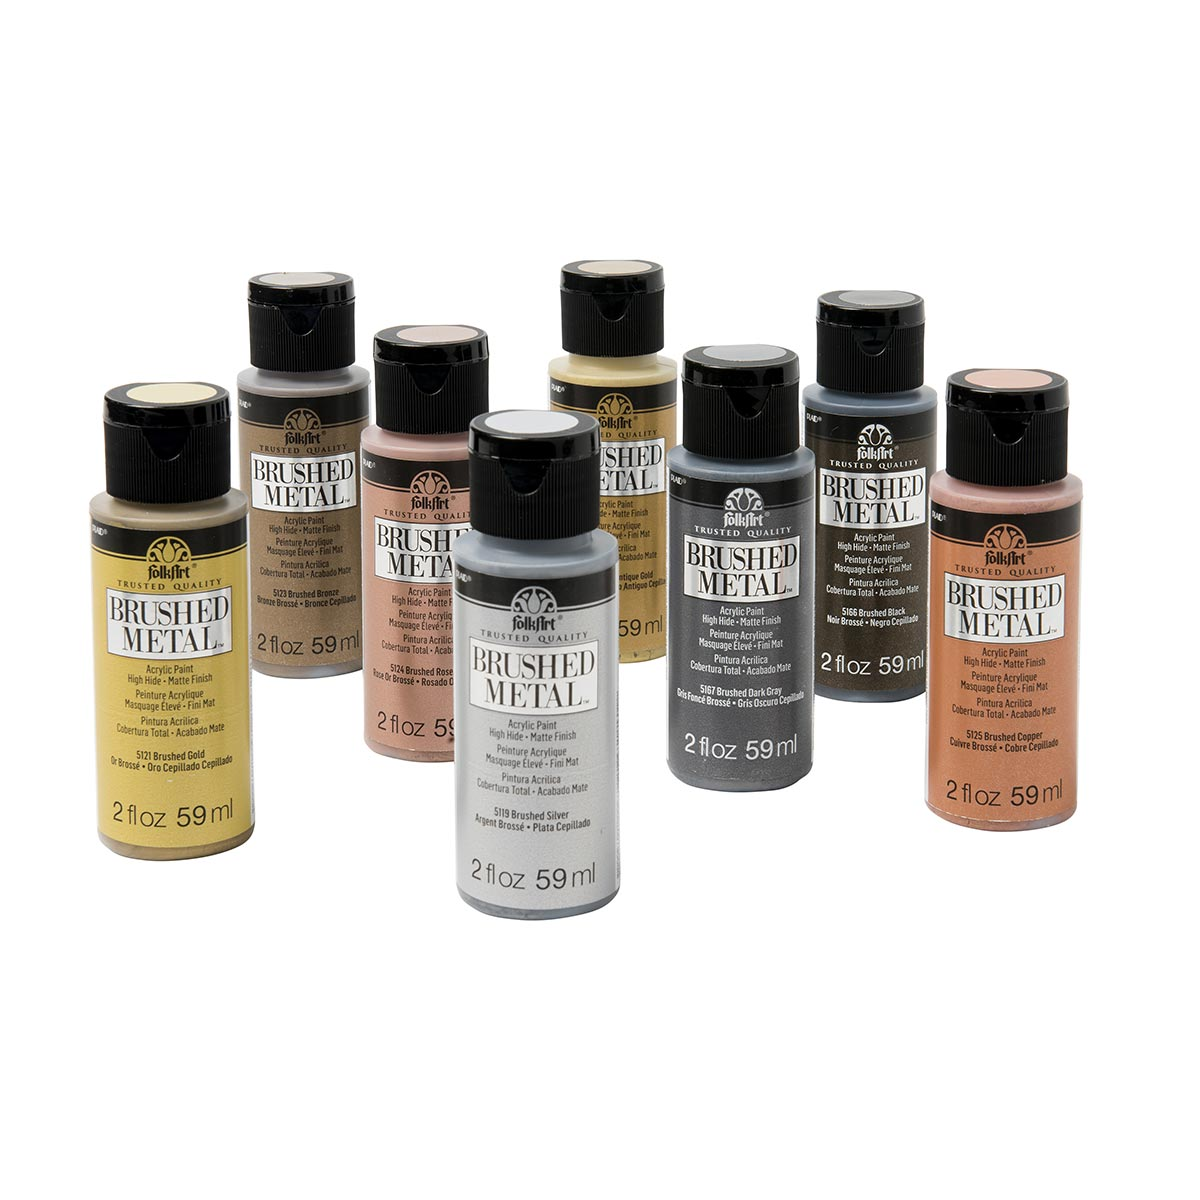 FolkArt ® Brushed Metal™ Acrylic Paint Set 8 Color